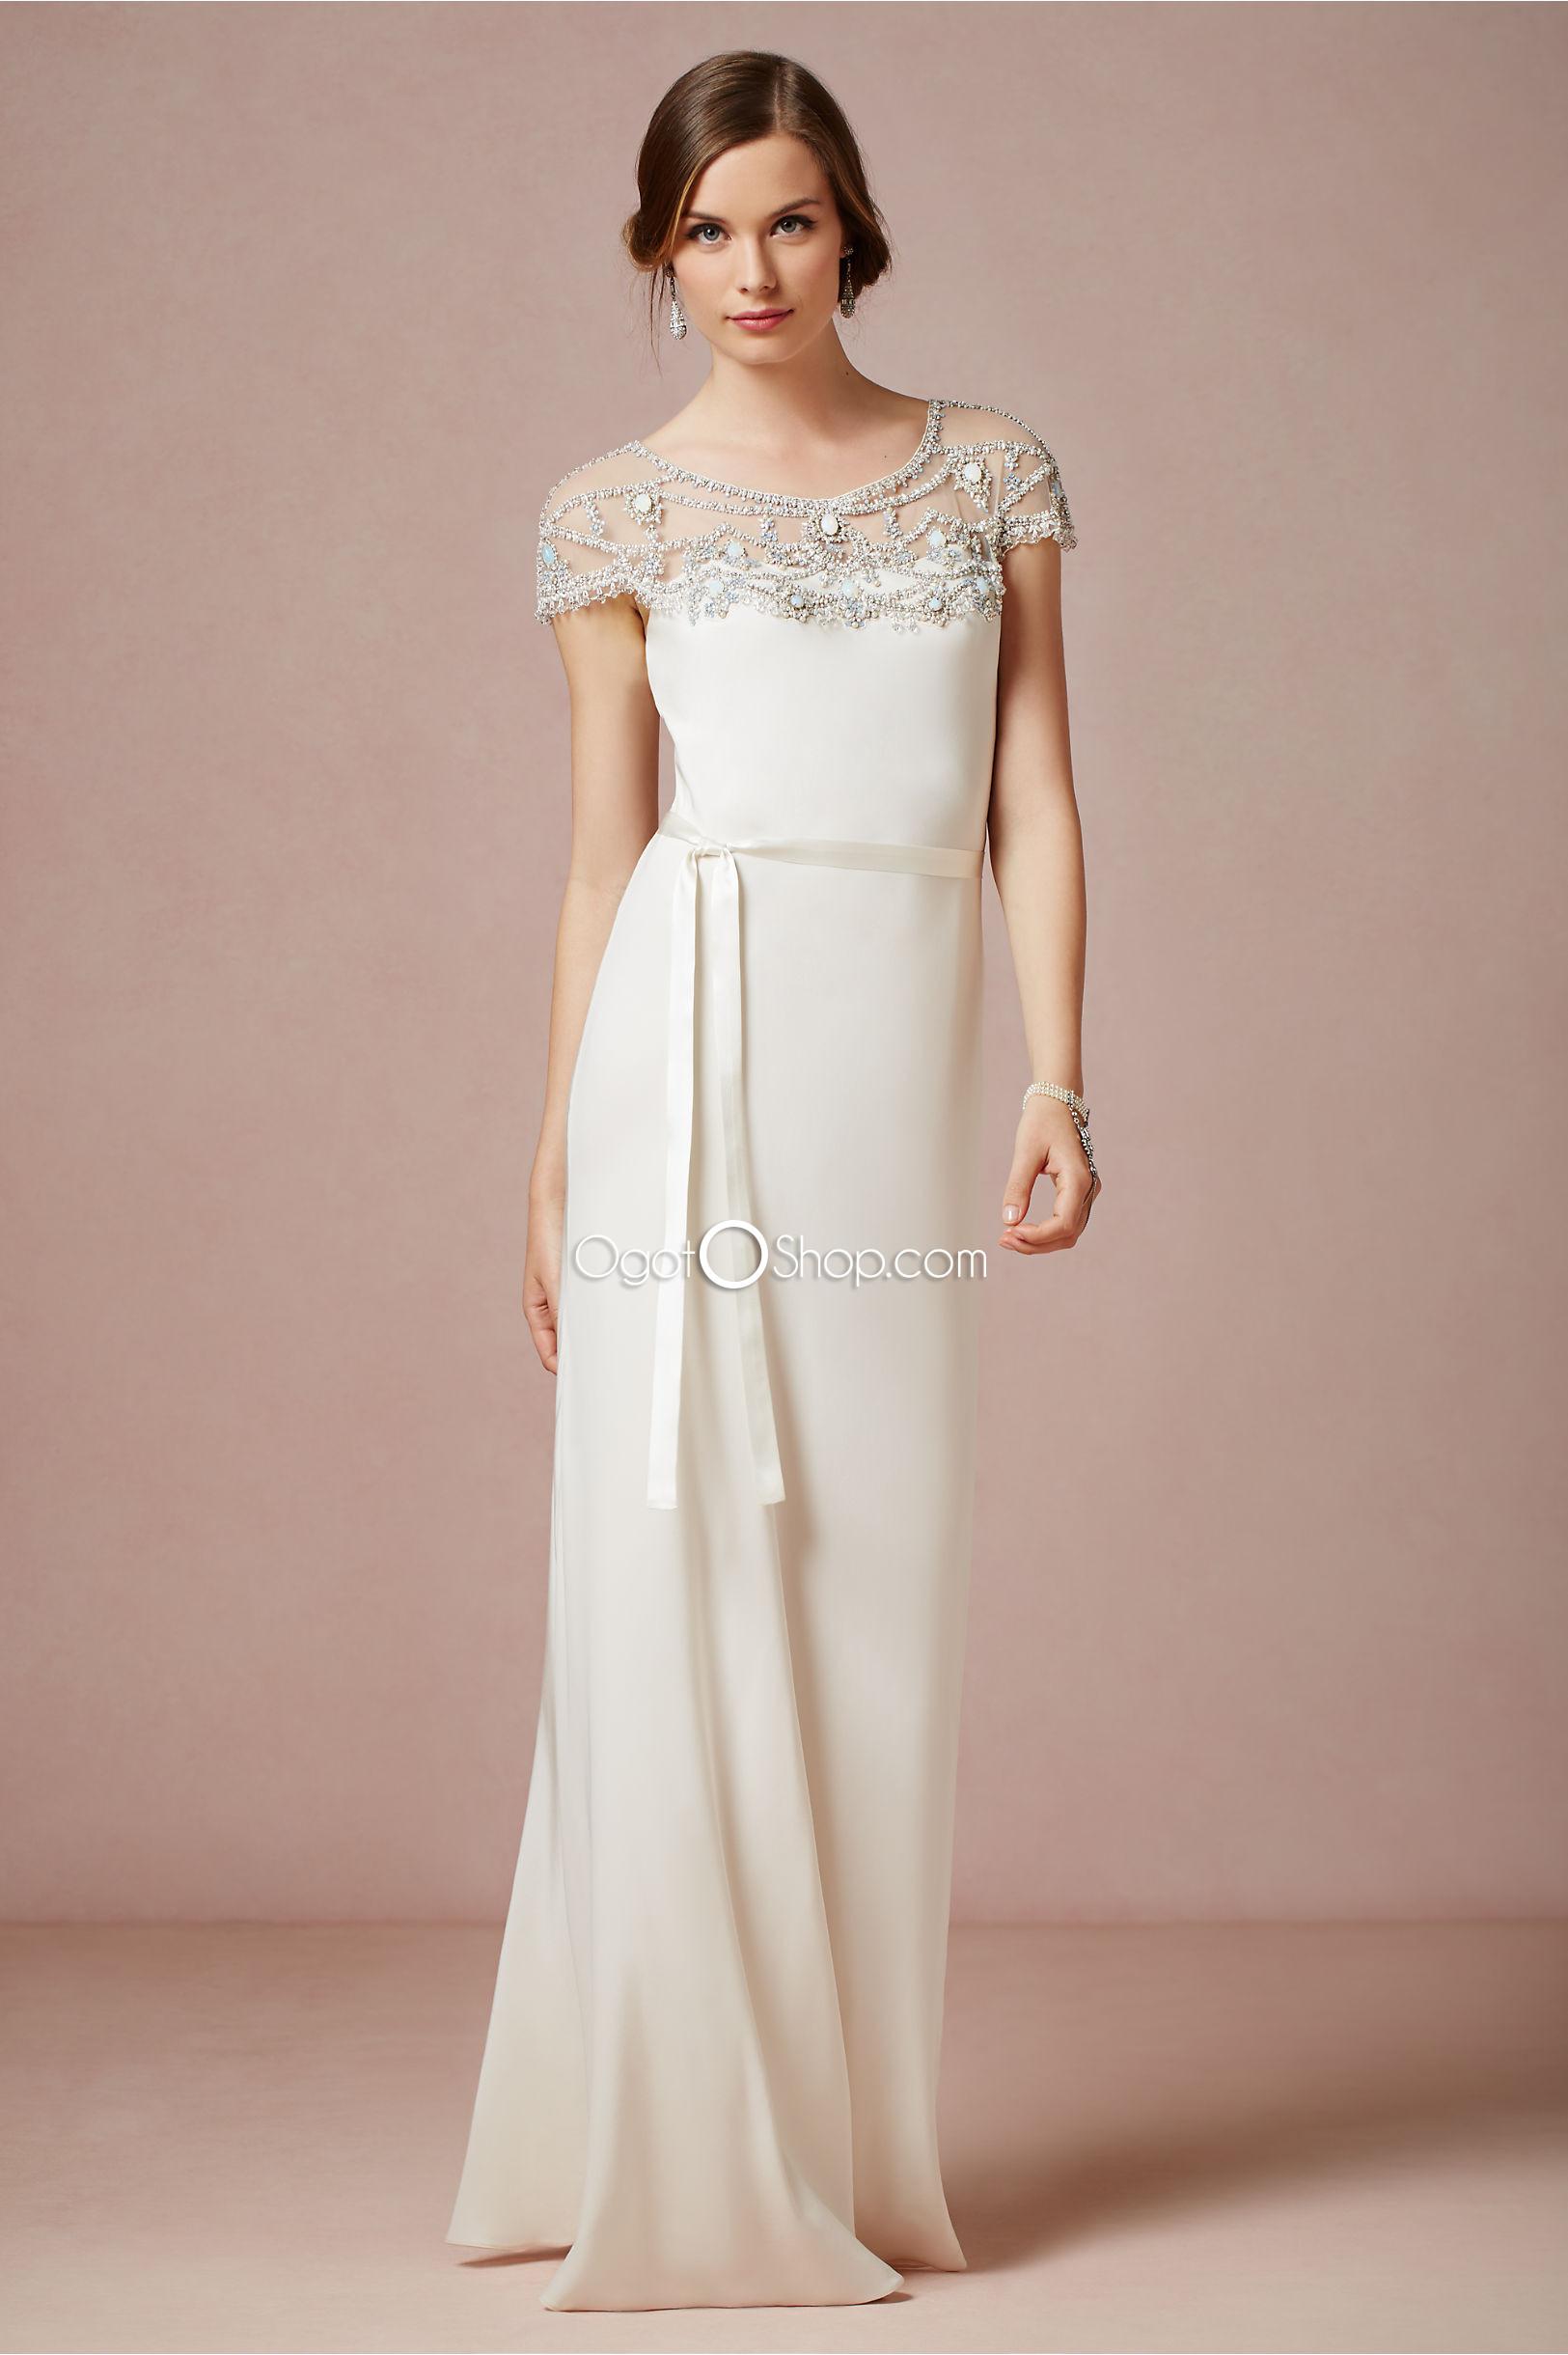 Jeweled Neckline Wedding Dresses